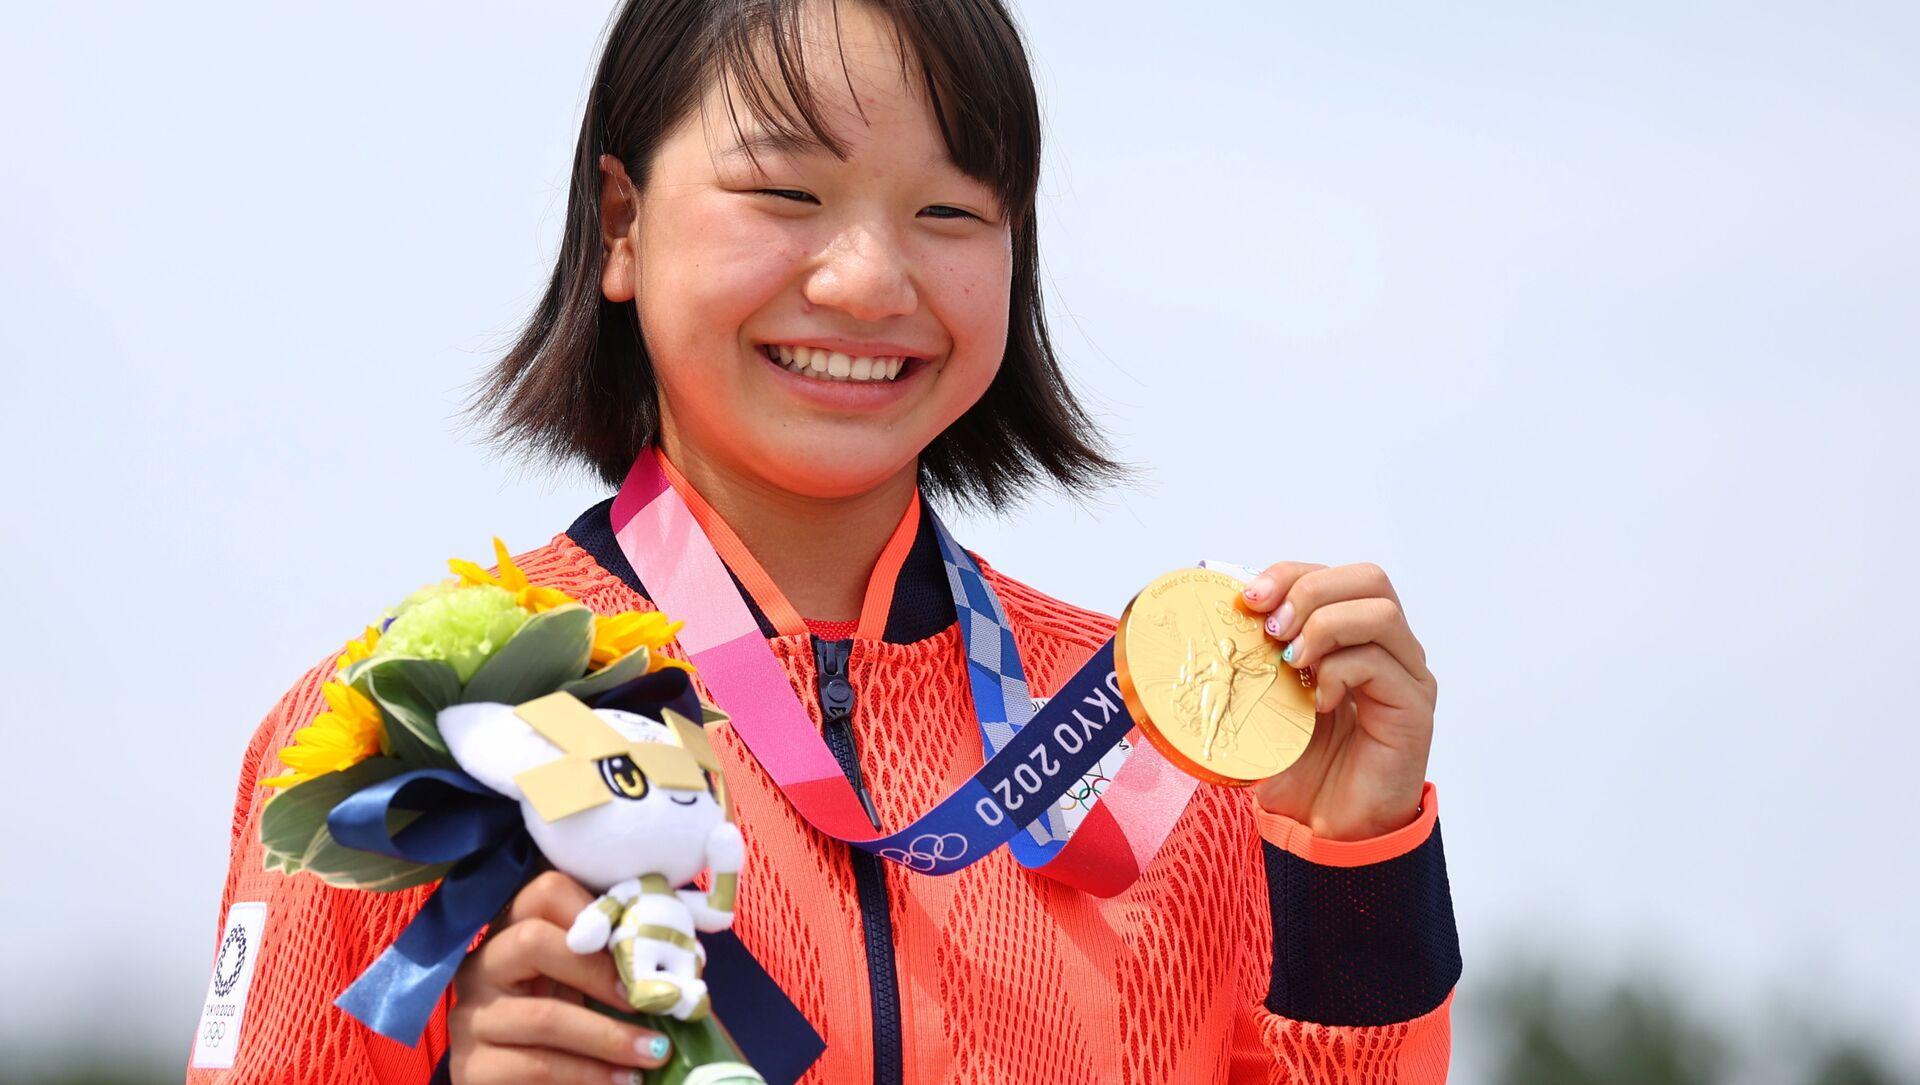 Tokyo 2020 Olympics - Skateboarding - Women's Street - Medal Ceremony - Ariake Urban Sports Park - Tokyo, Japan - July 26, 2021. Momiji Nishiya of Japan poses with her gold medal during medal ceremony.  - Sputnik International, 1920, 28.07.2021